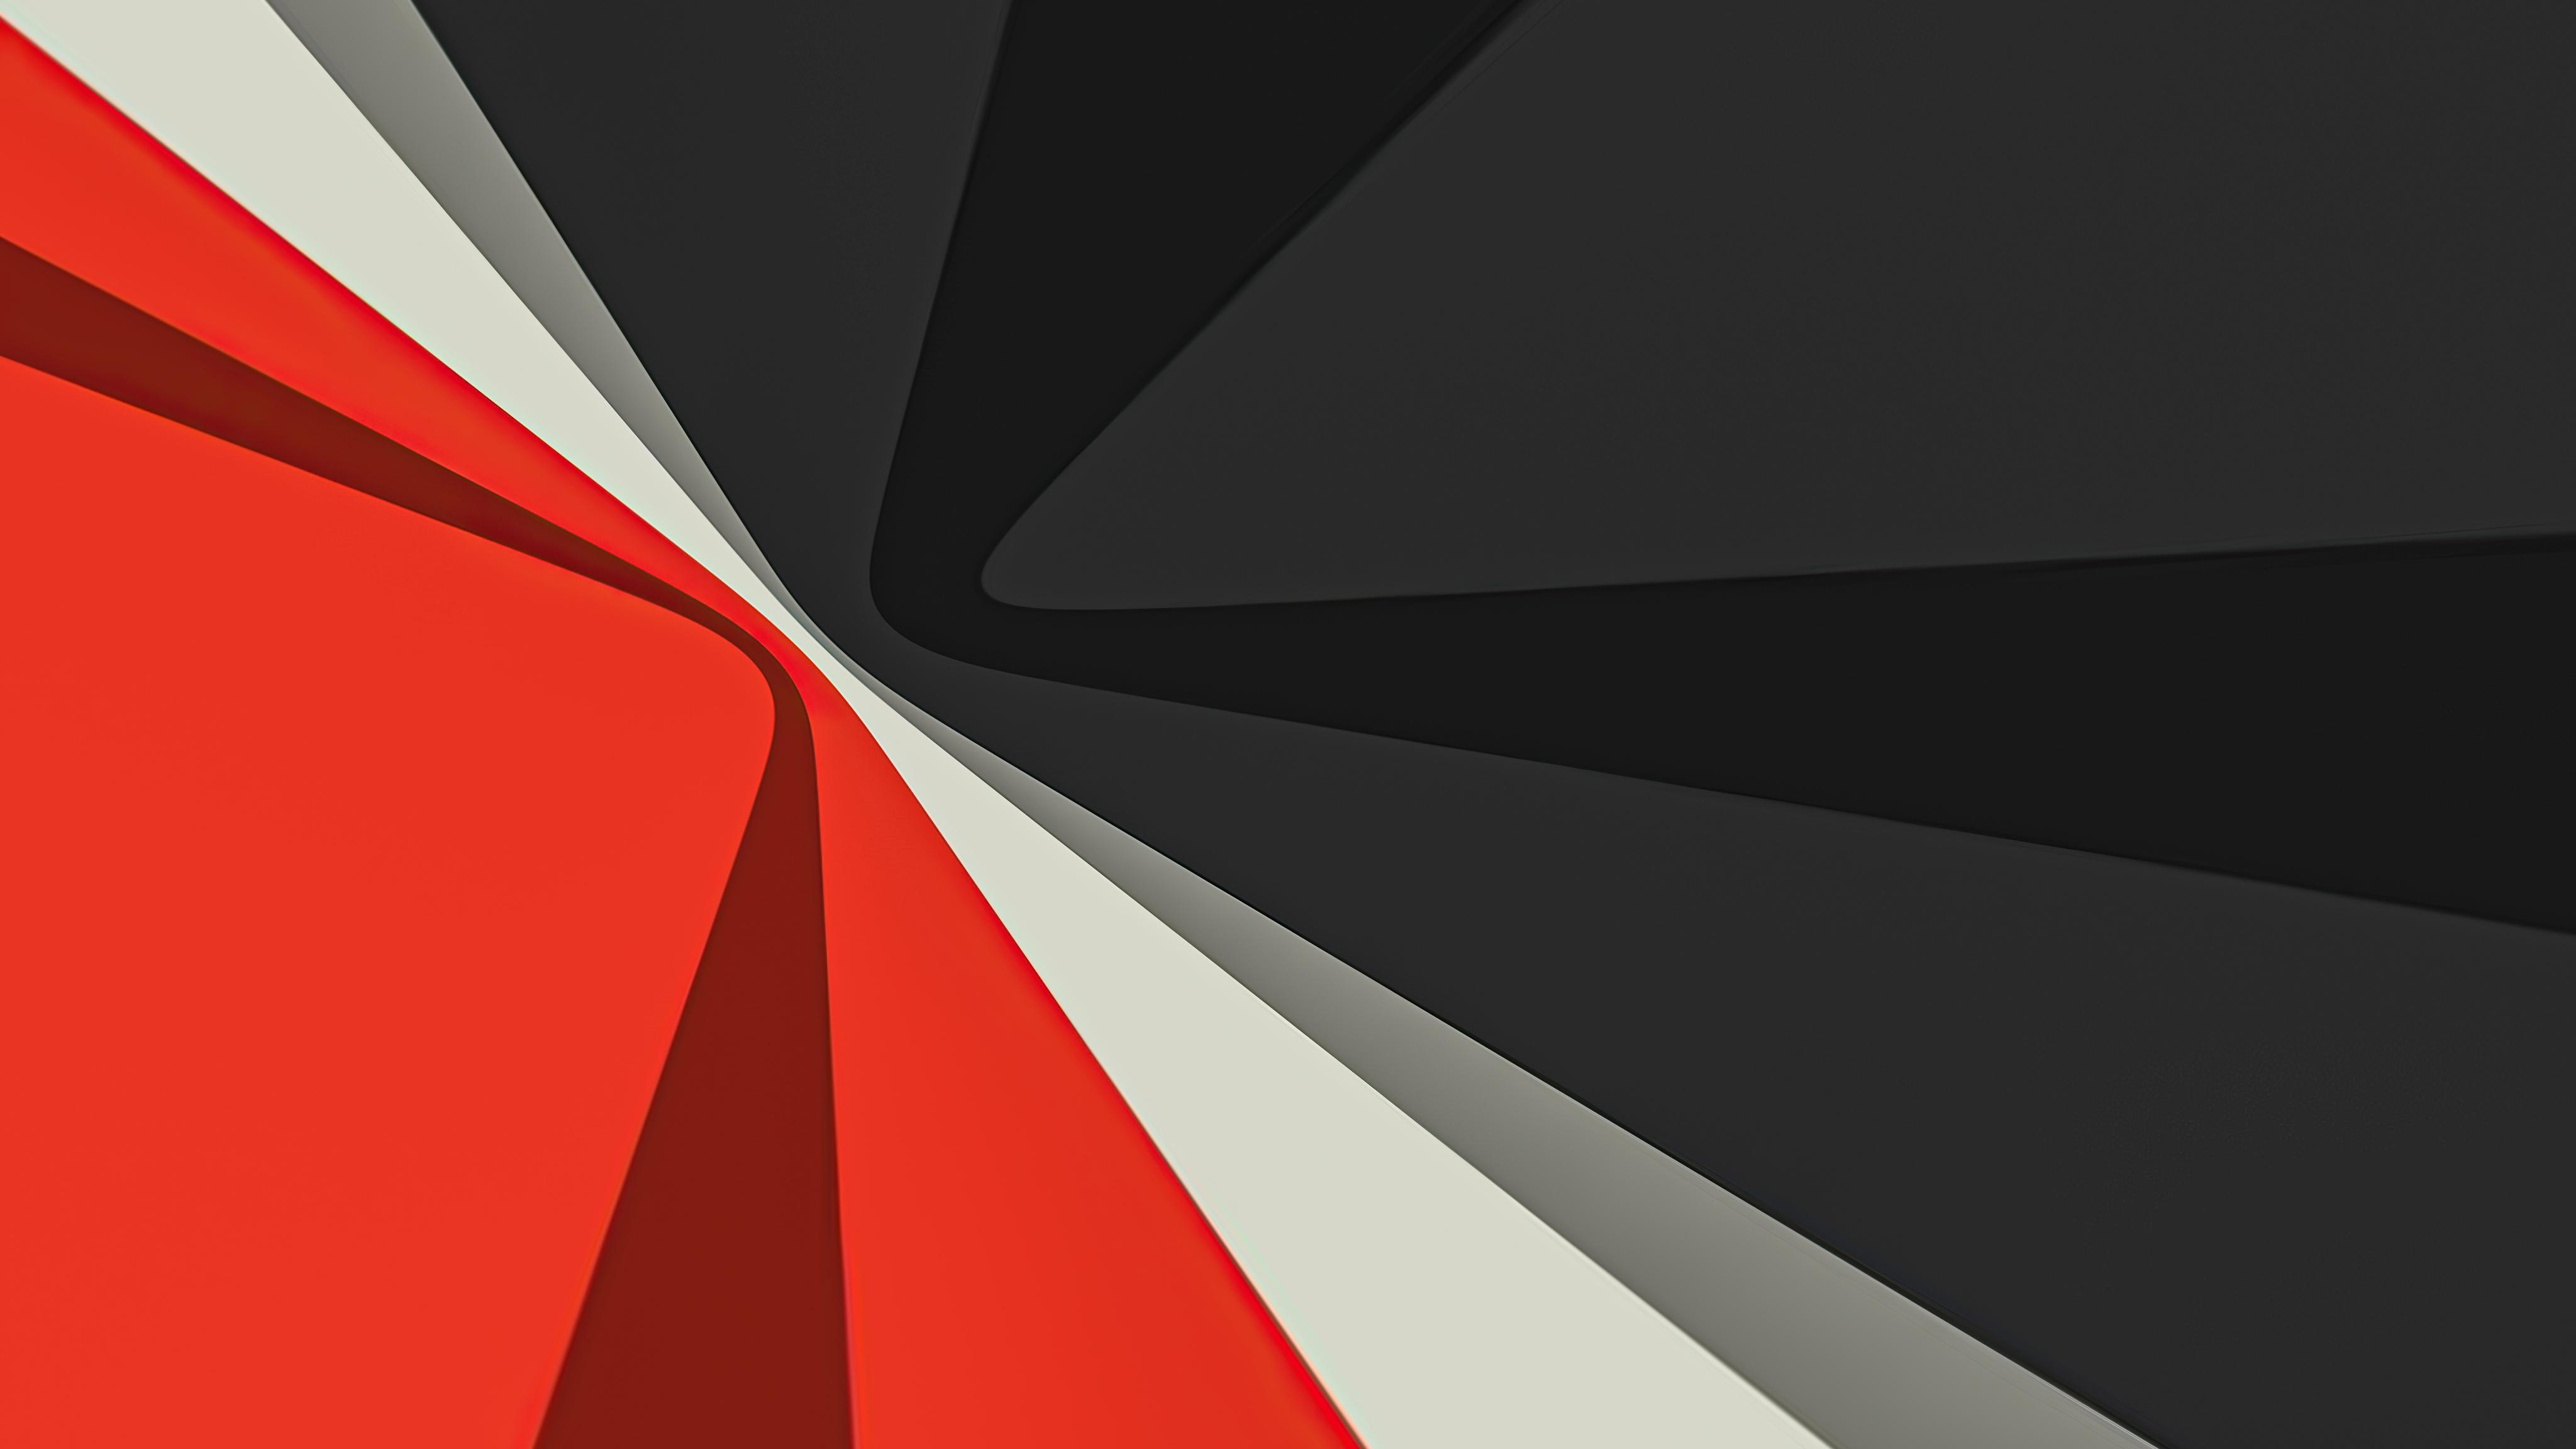 abstract orange dark colors 4k 1620165330 - Abstract Orange Dark Colors 4k - Abstract Orange Dark Colors 4k wallpapers